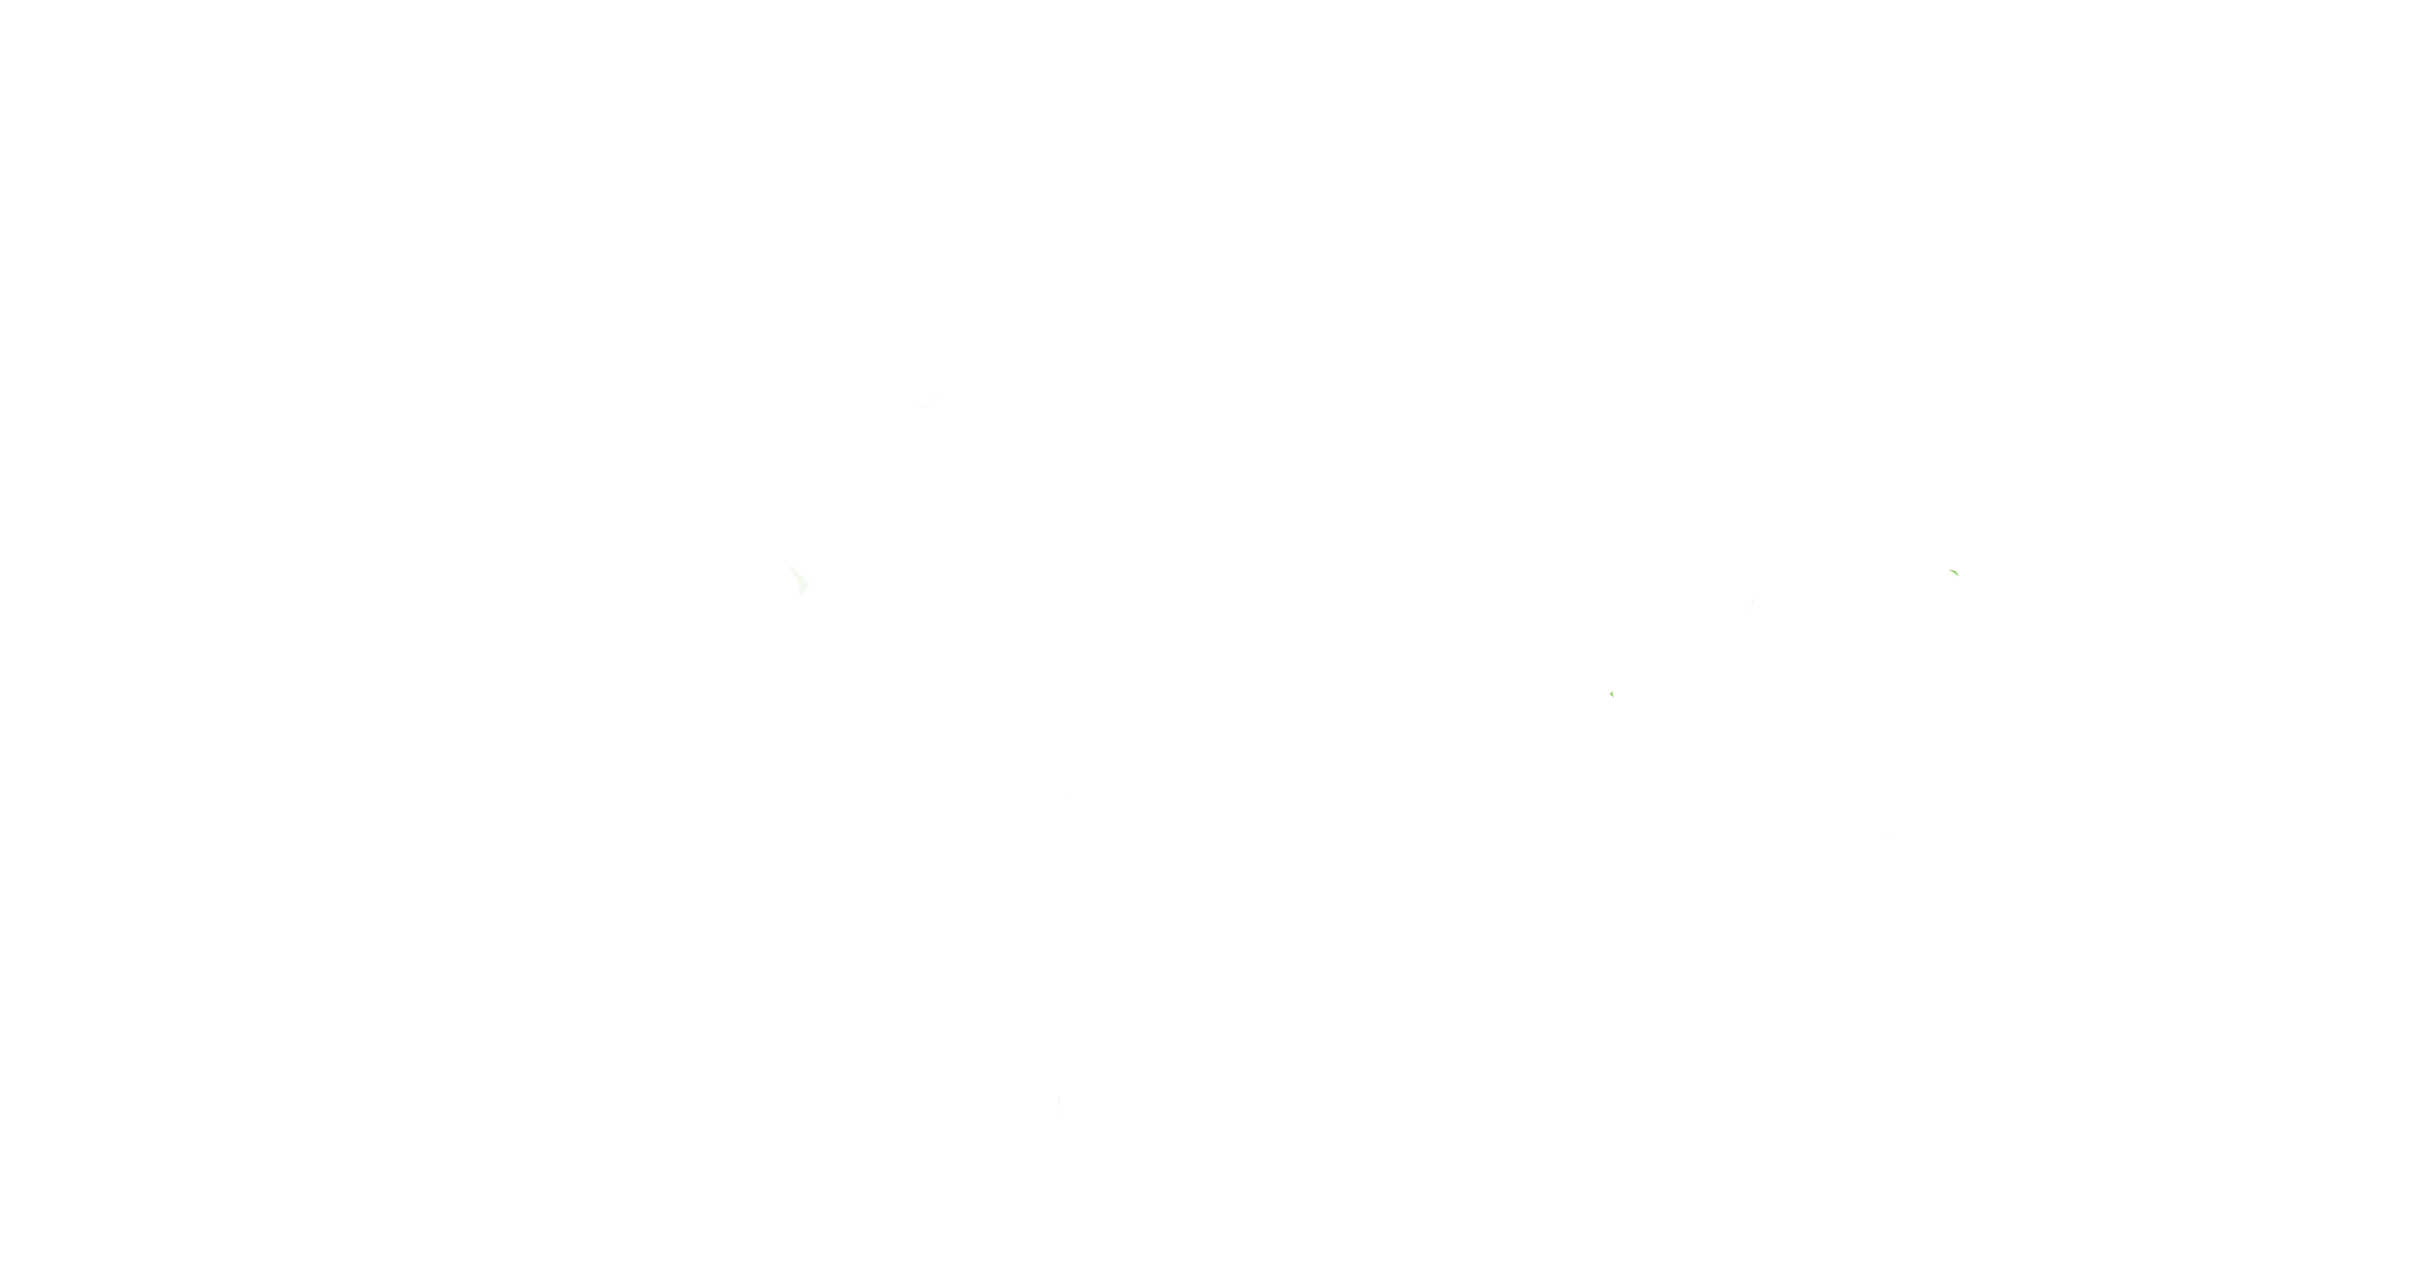 GreenwichLaurel_MD_WHITE.png